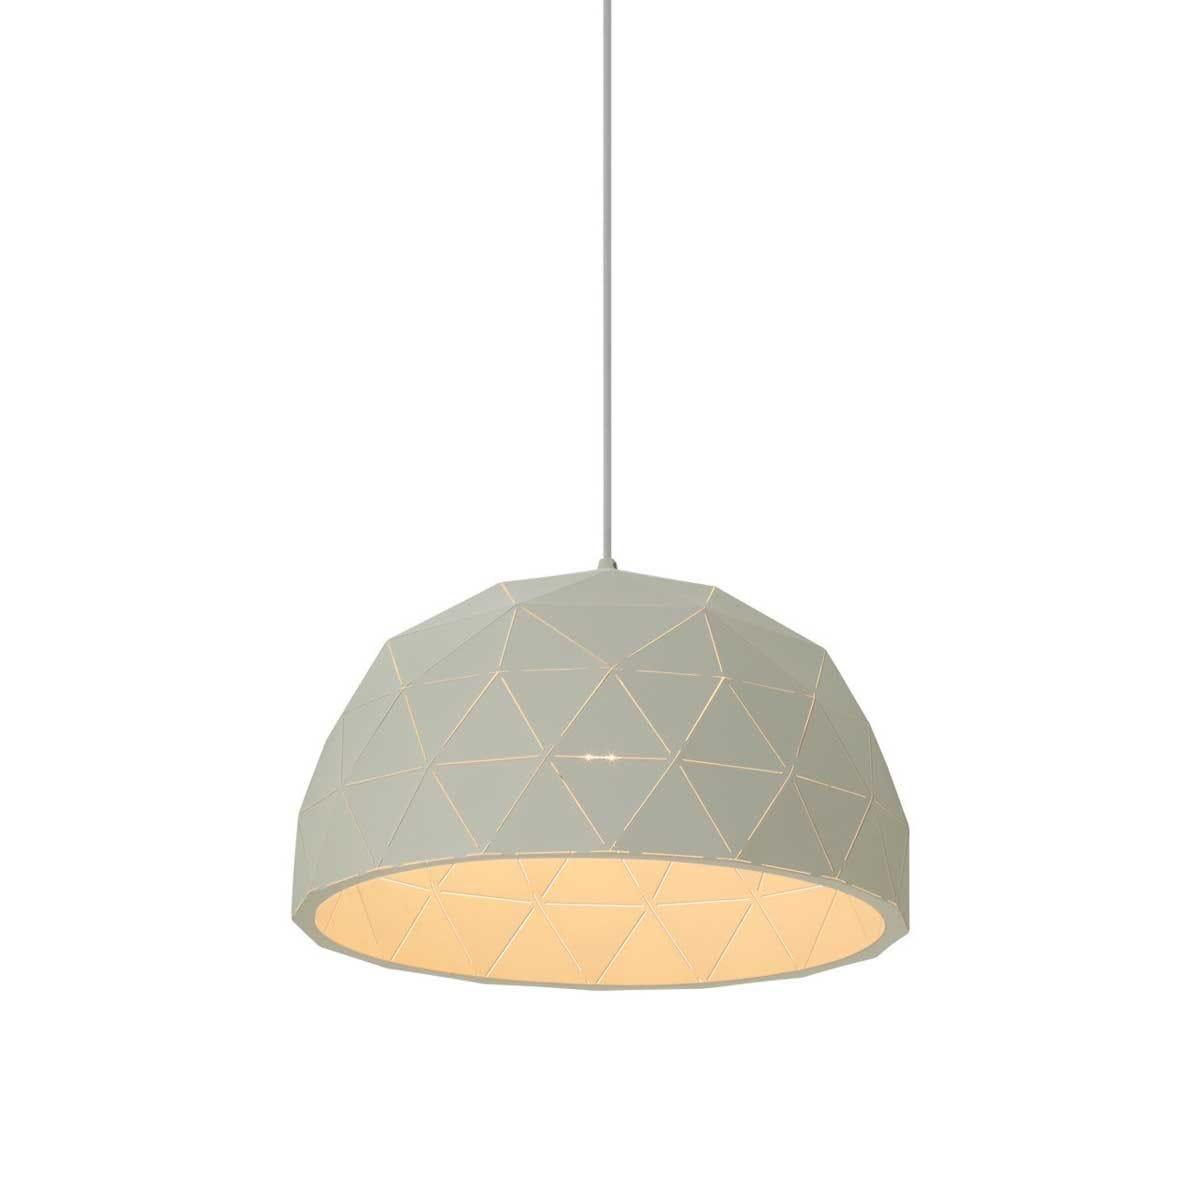 Premier Housewares Mateo Small Dome Pendant Light - White